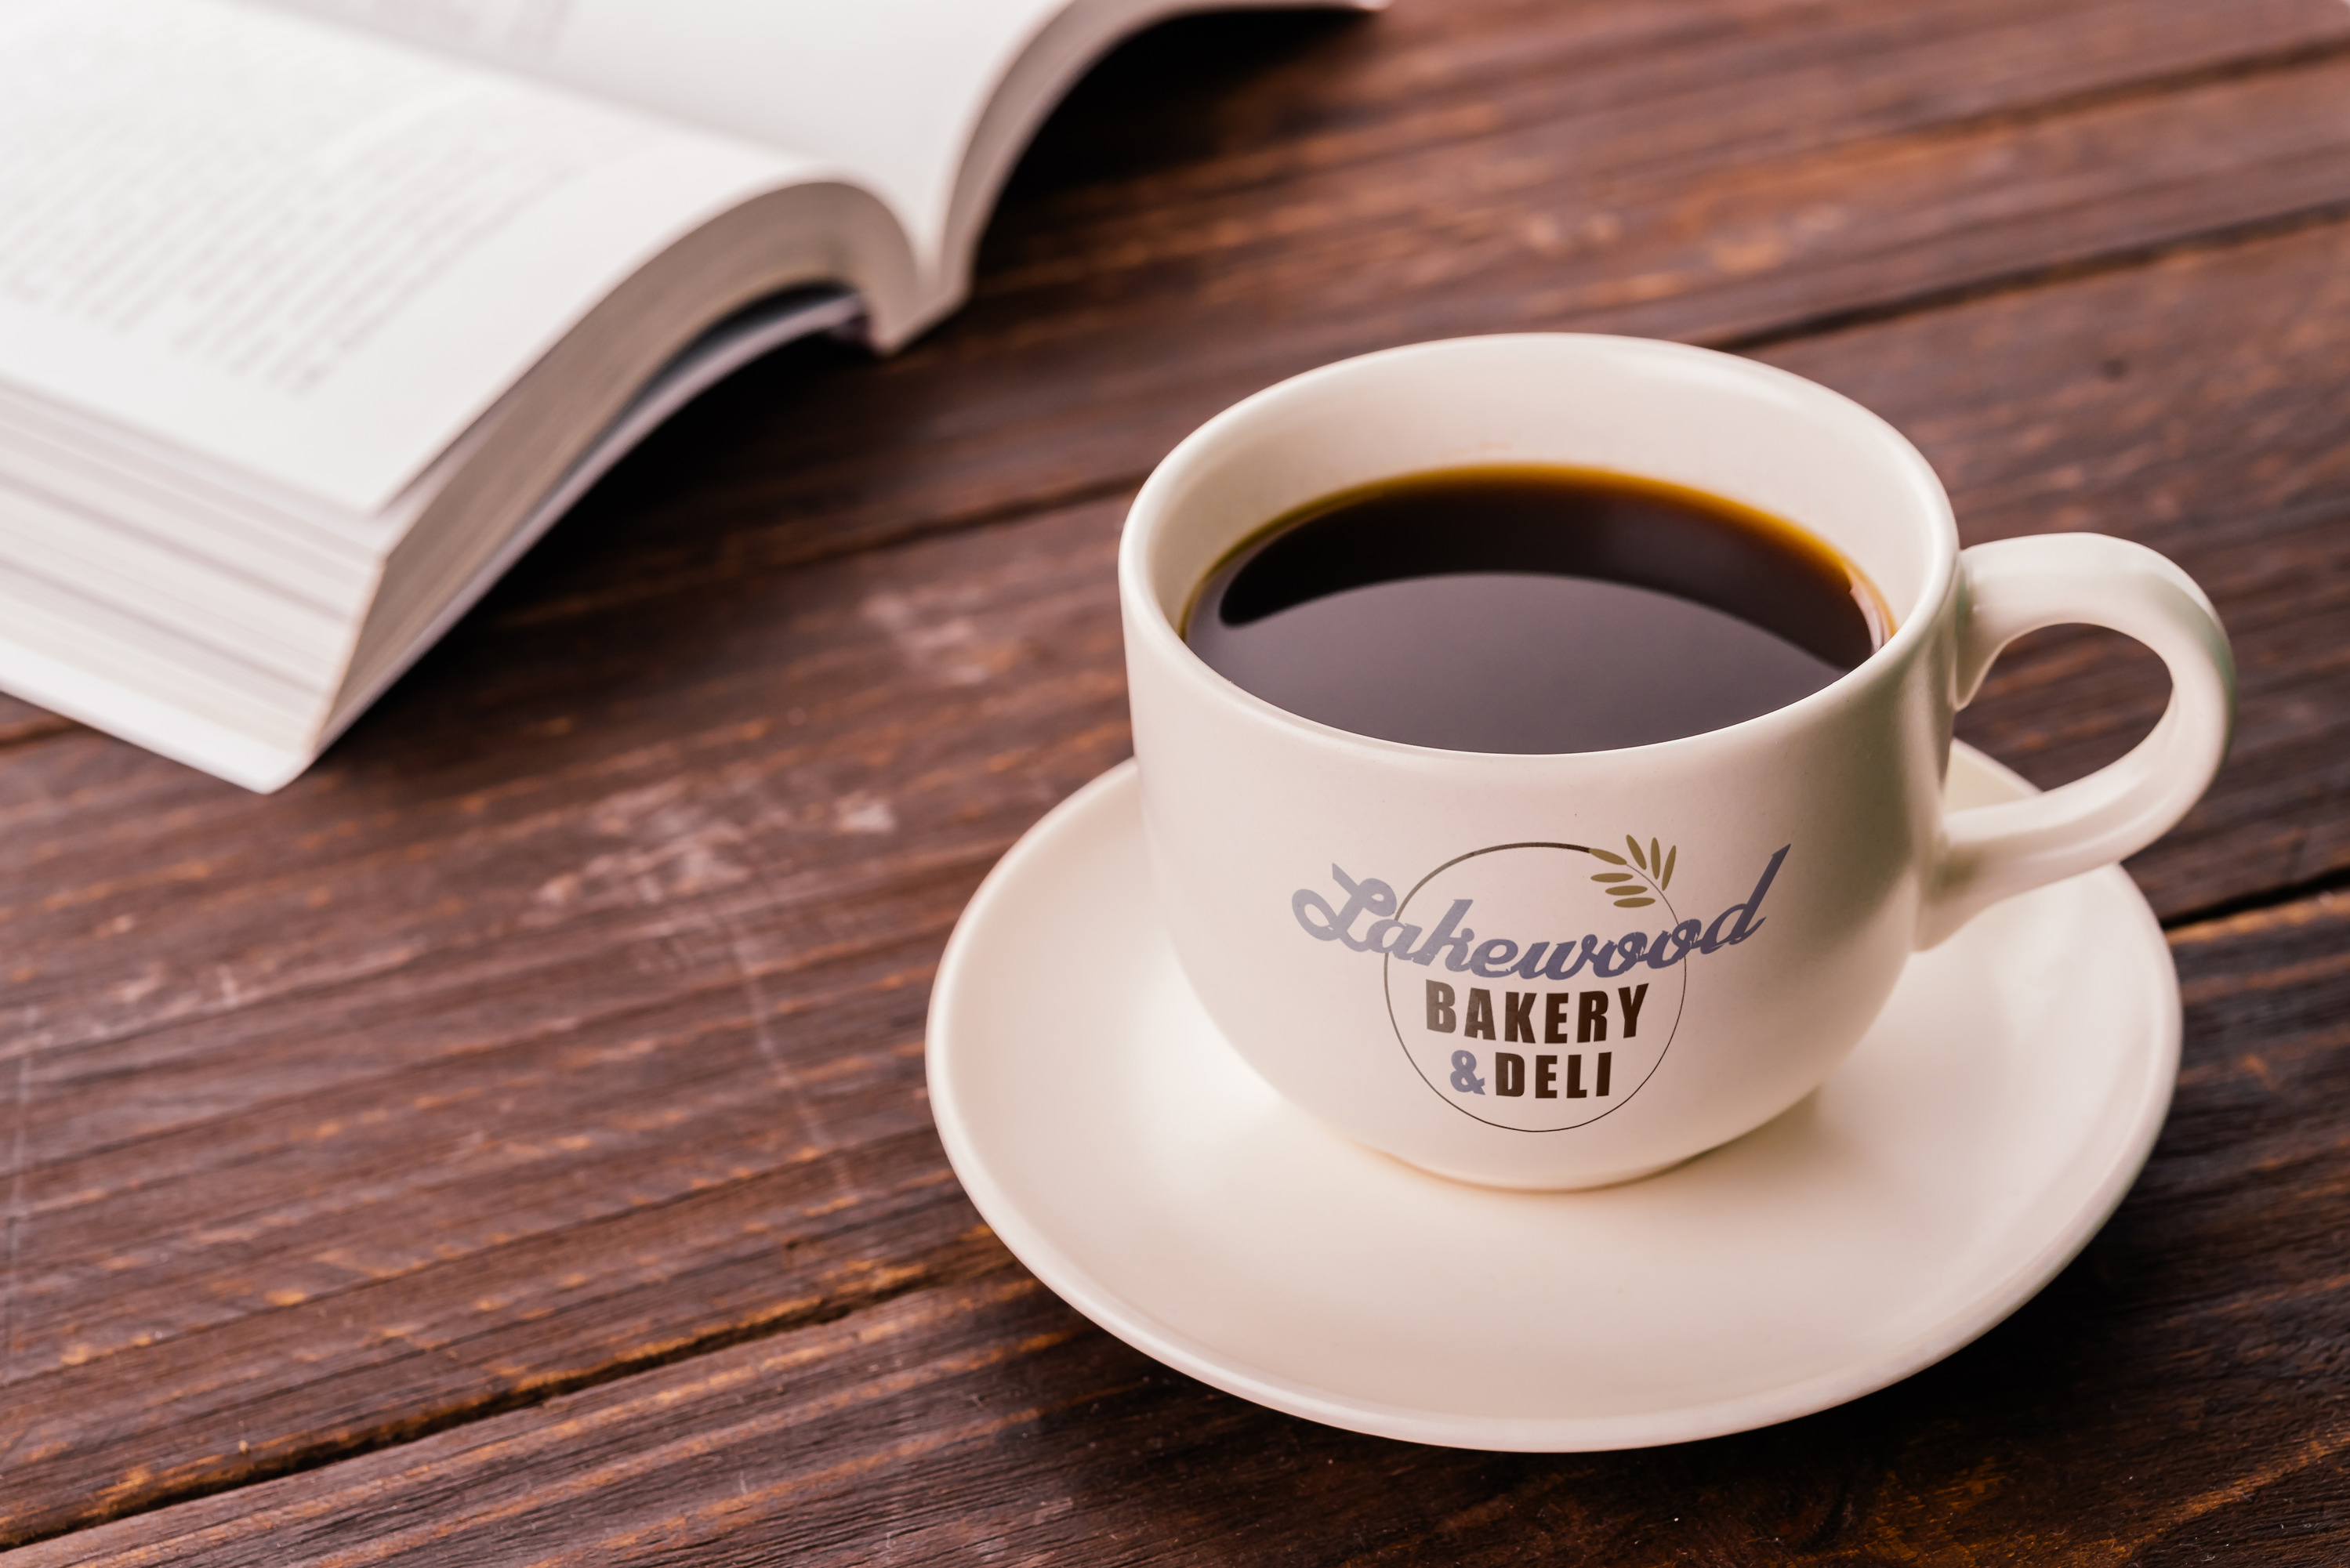 Lakewood Bakery & Deli logo printed on coffee mug